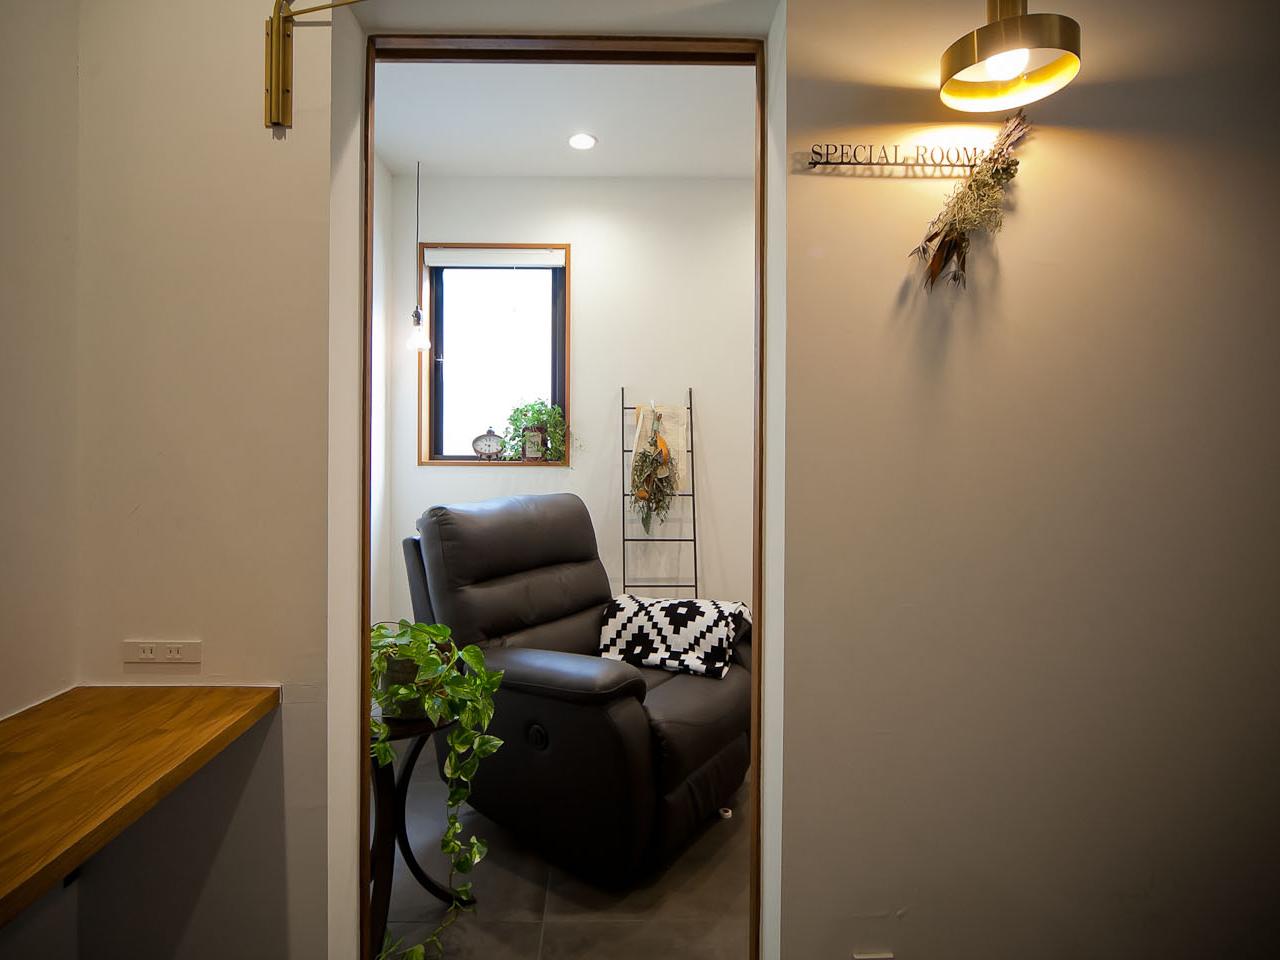 eyelash defi - 周りの目を気にせず過ごせる、完全個室のプライベートサロン◇カウンセリングから仕上がりまで丁寧に施術致します、贅沢なサロンタイムを過ごしませんか?